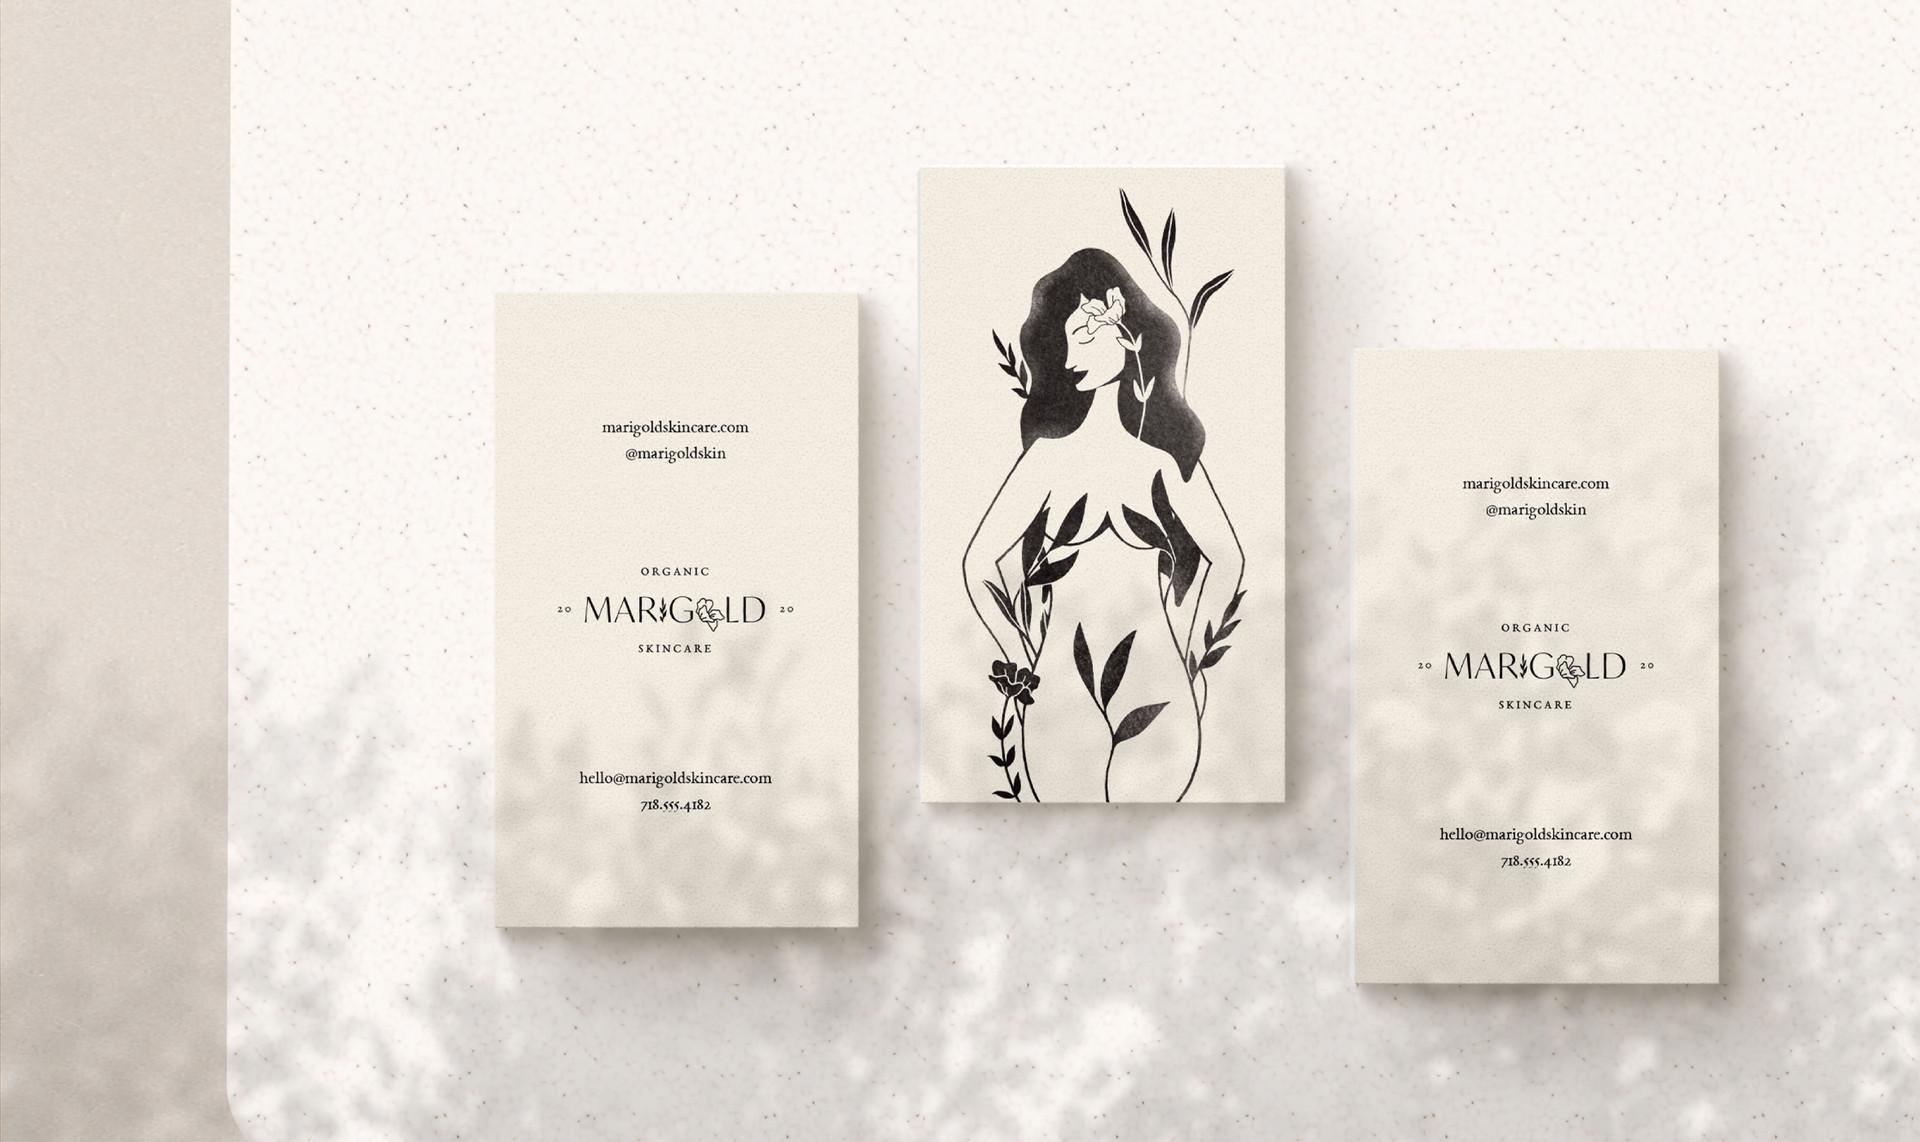 Marigold-BrandingBoard_02-07.jpg